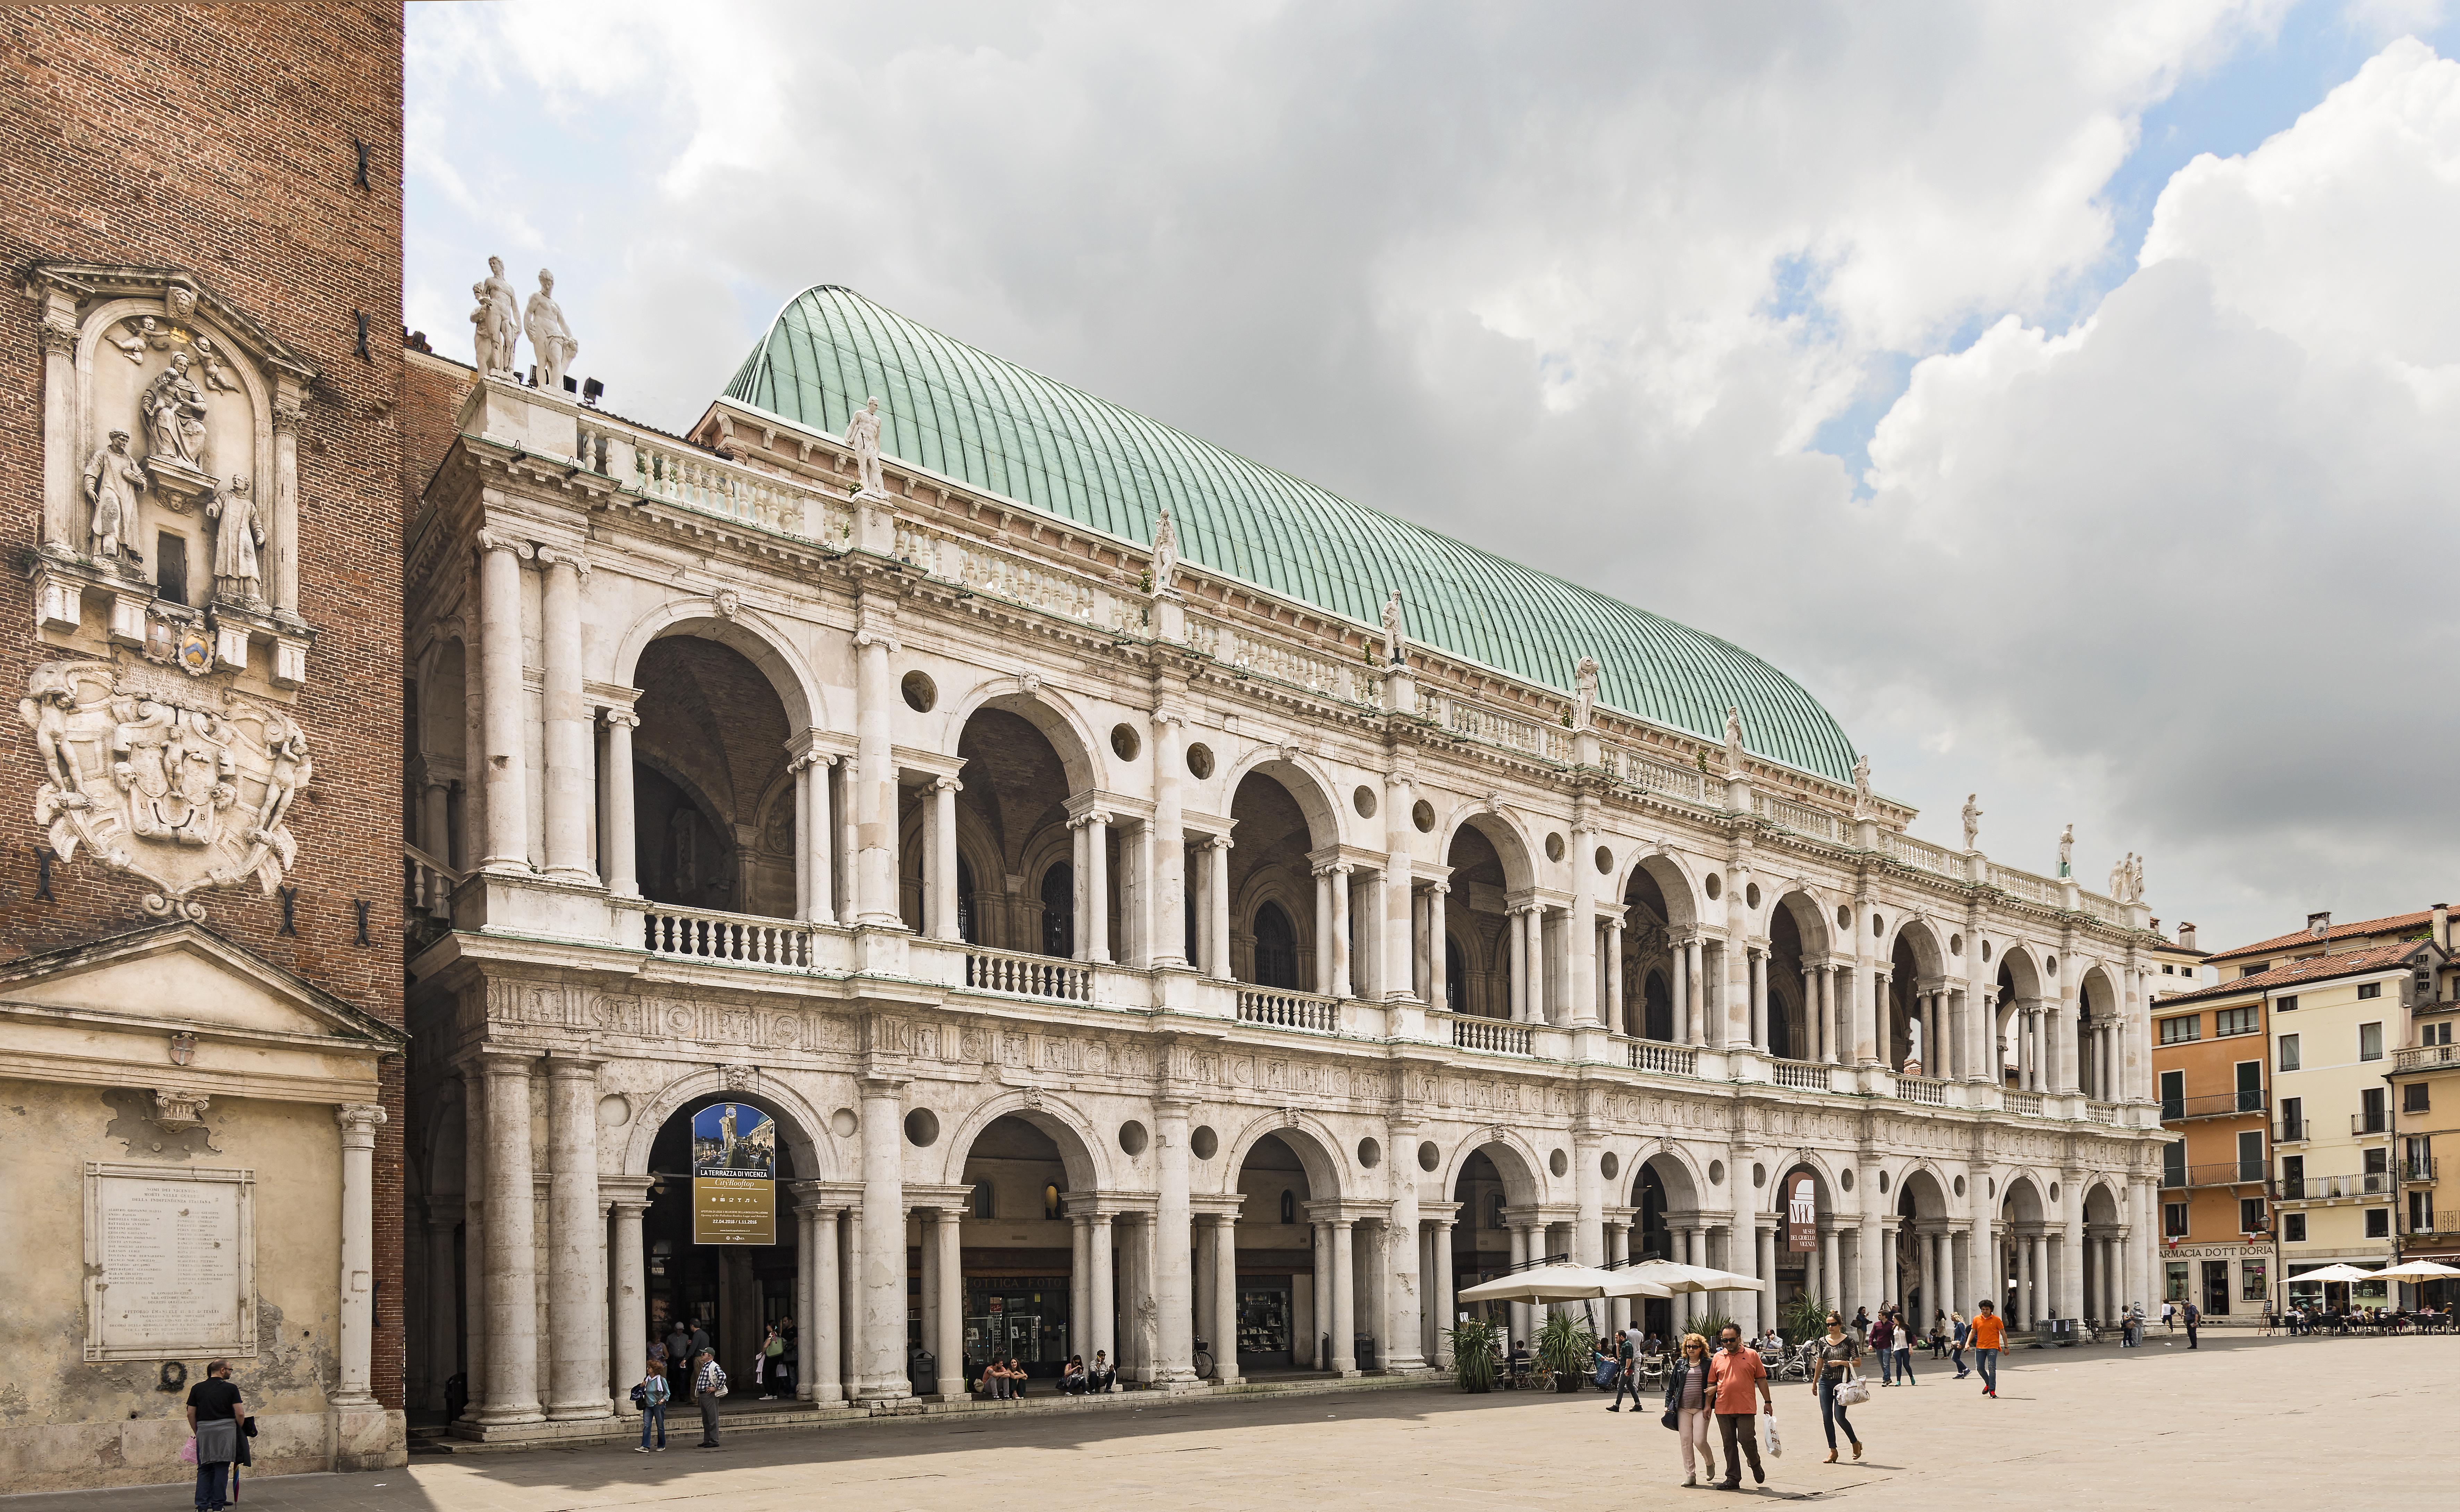 Museo del Gioiello in Basilica Palladiana, Vicenza, 2016. Foto met dank aan Didier Descouens, CC BY-SA 4.0